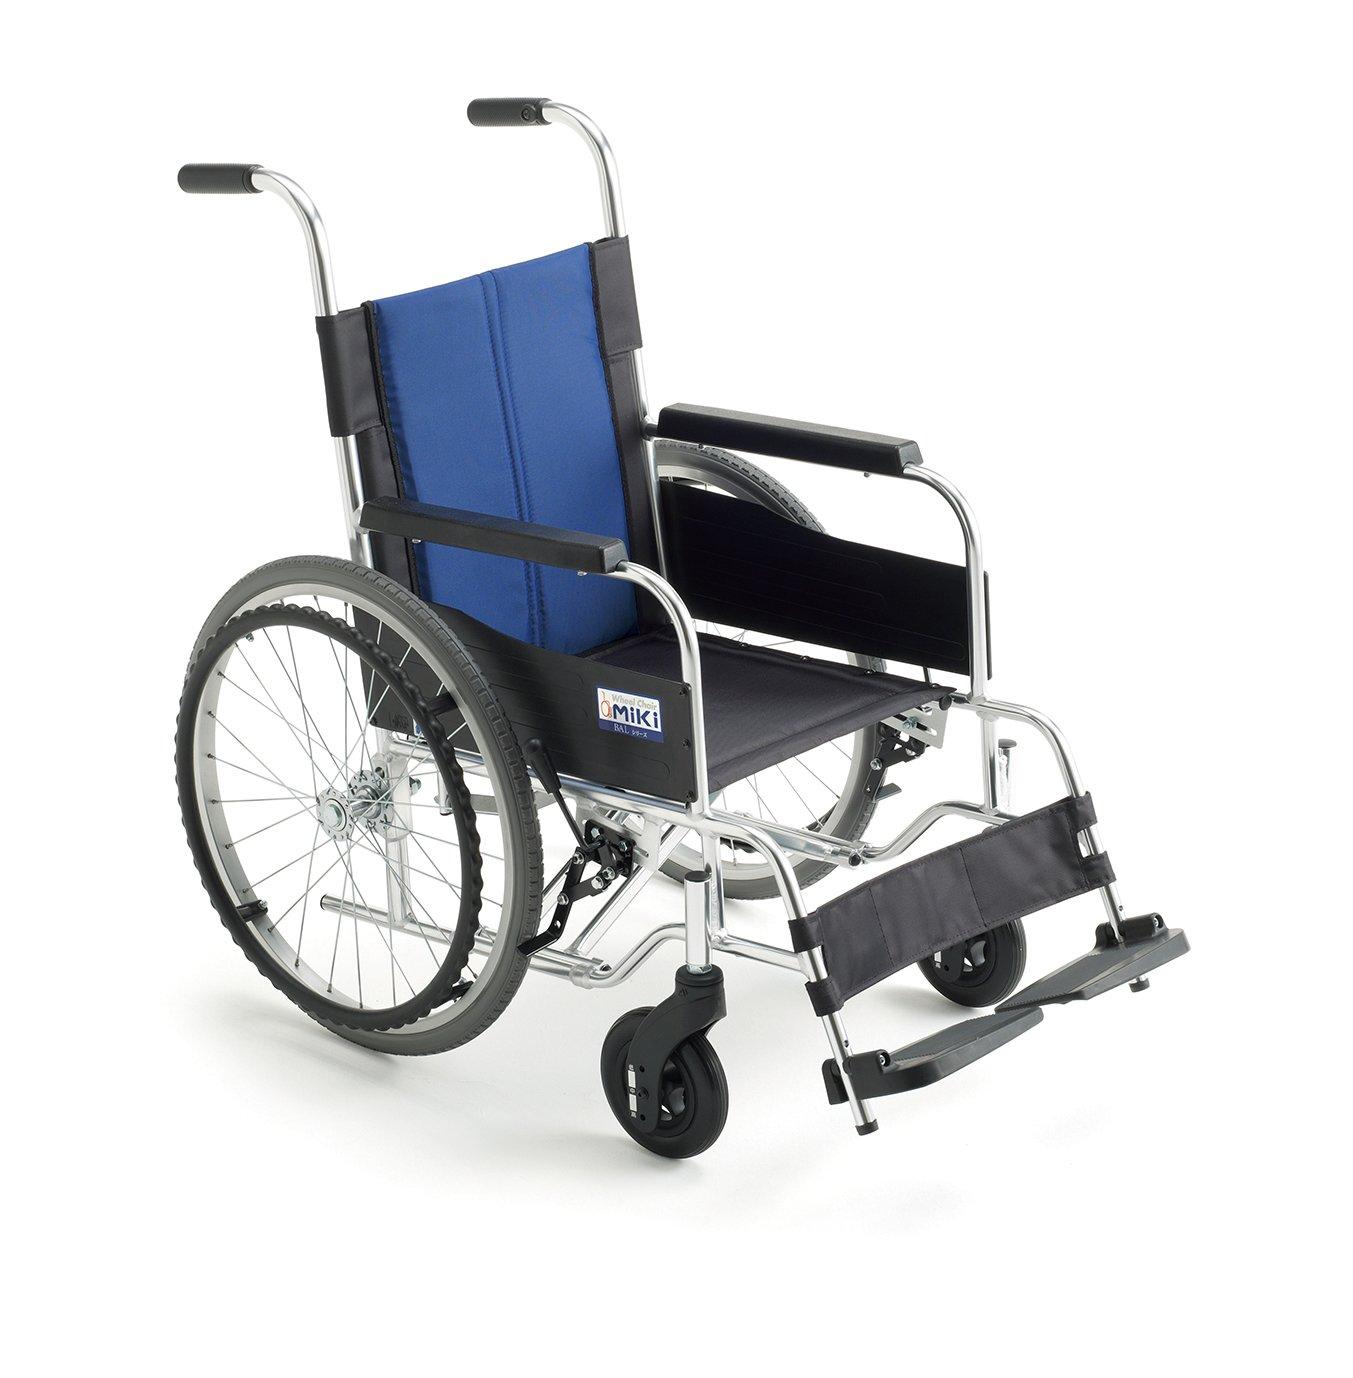 MiKi(ミキ)アルミ製車椅子 BAL-0S B00KLPMZ2A